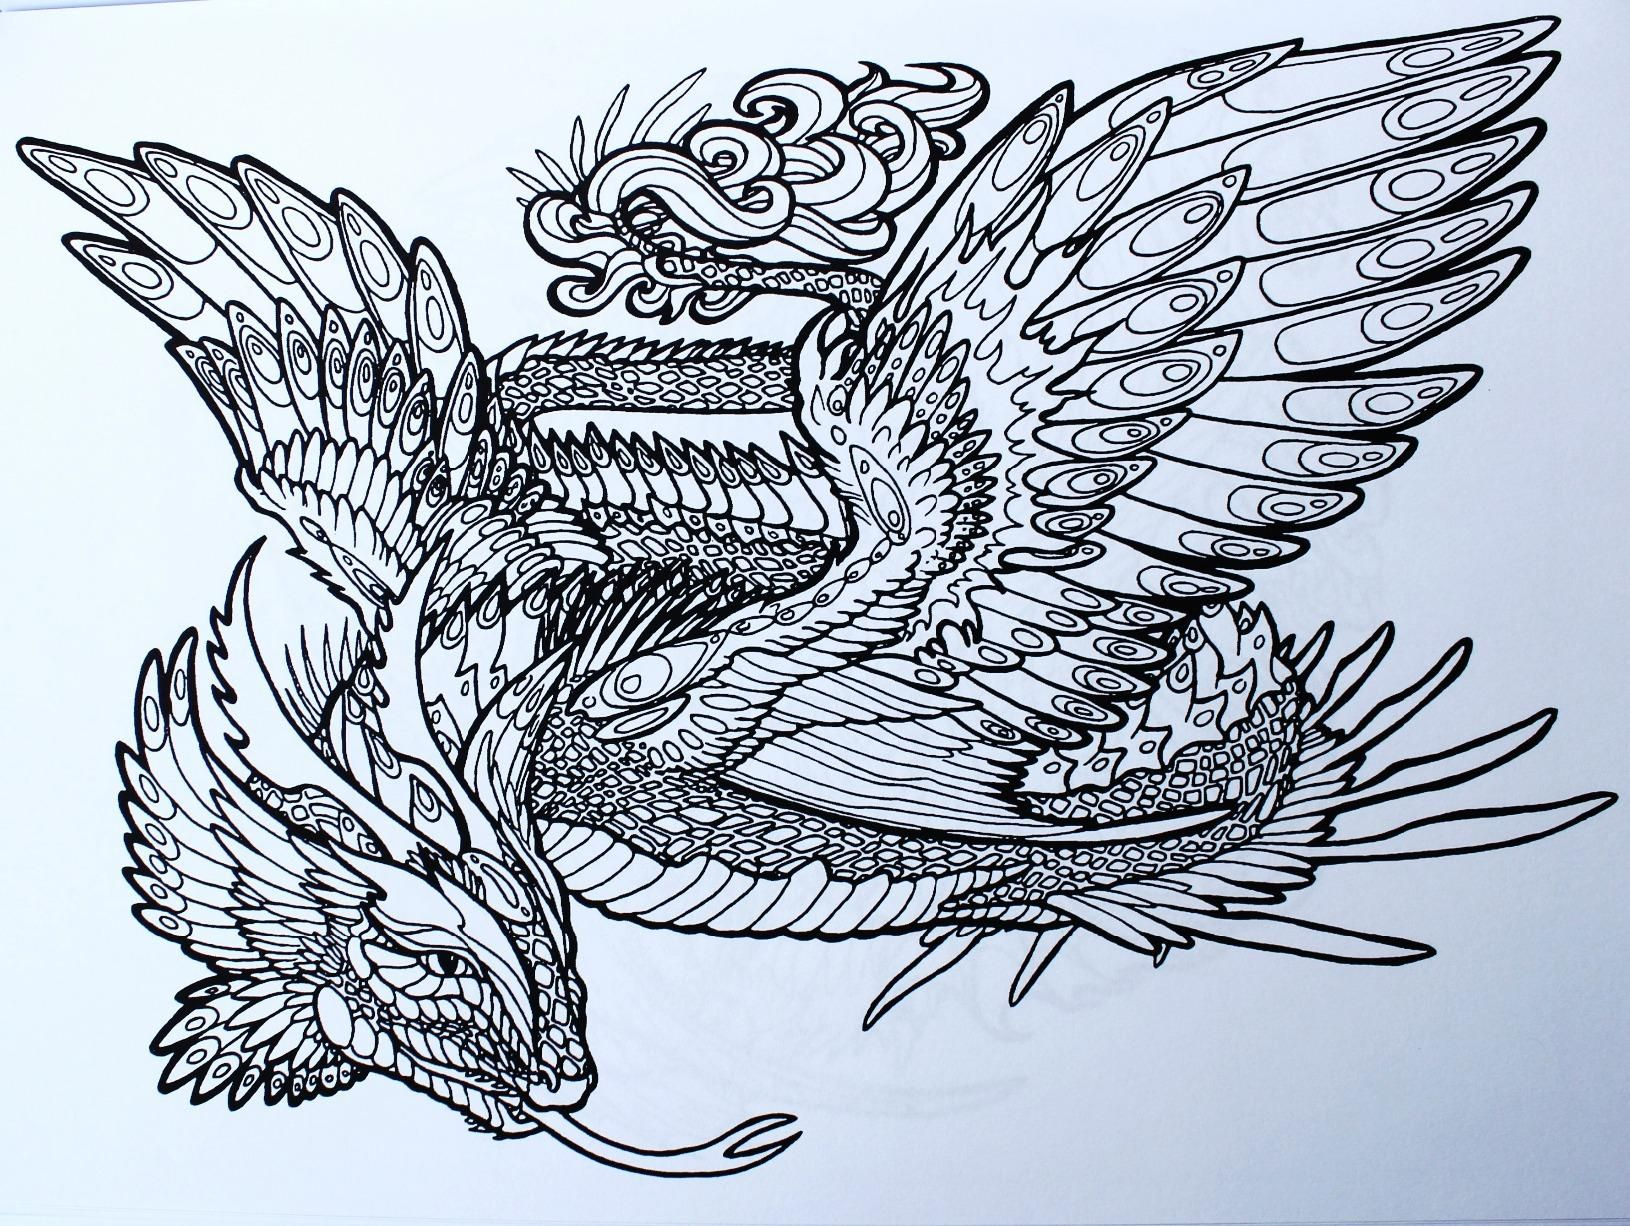 Amazon.com: Dragon Adventure: A Kaleidoscopia Coloring Book (9781515255154): Rachael Mayo, Kaleidoscopia Coloring Books, August Stewart Johnston: Books